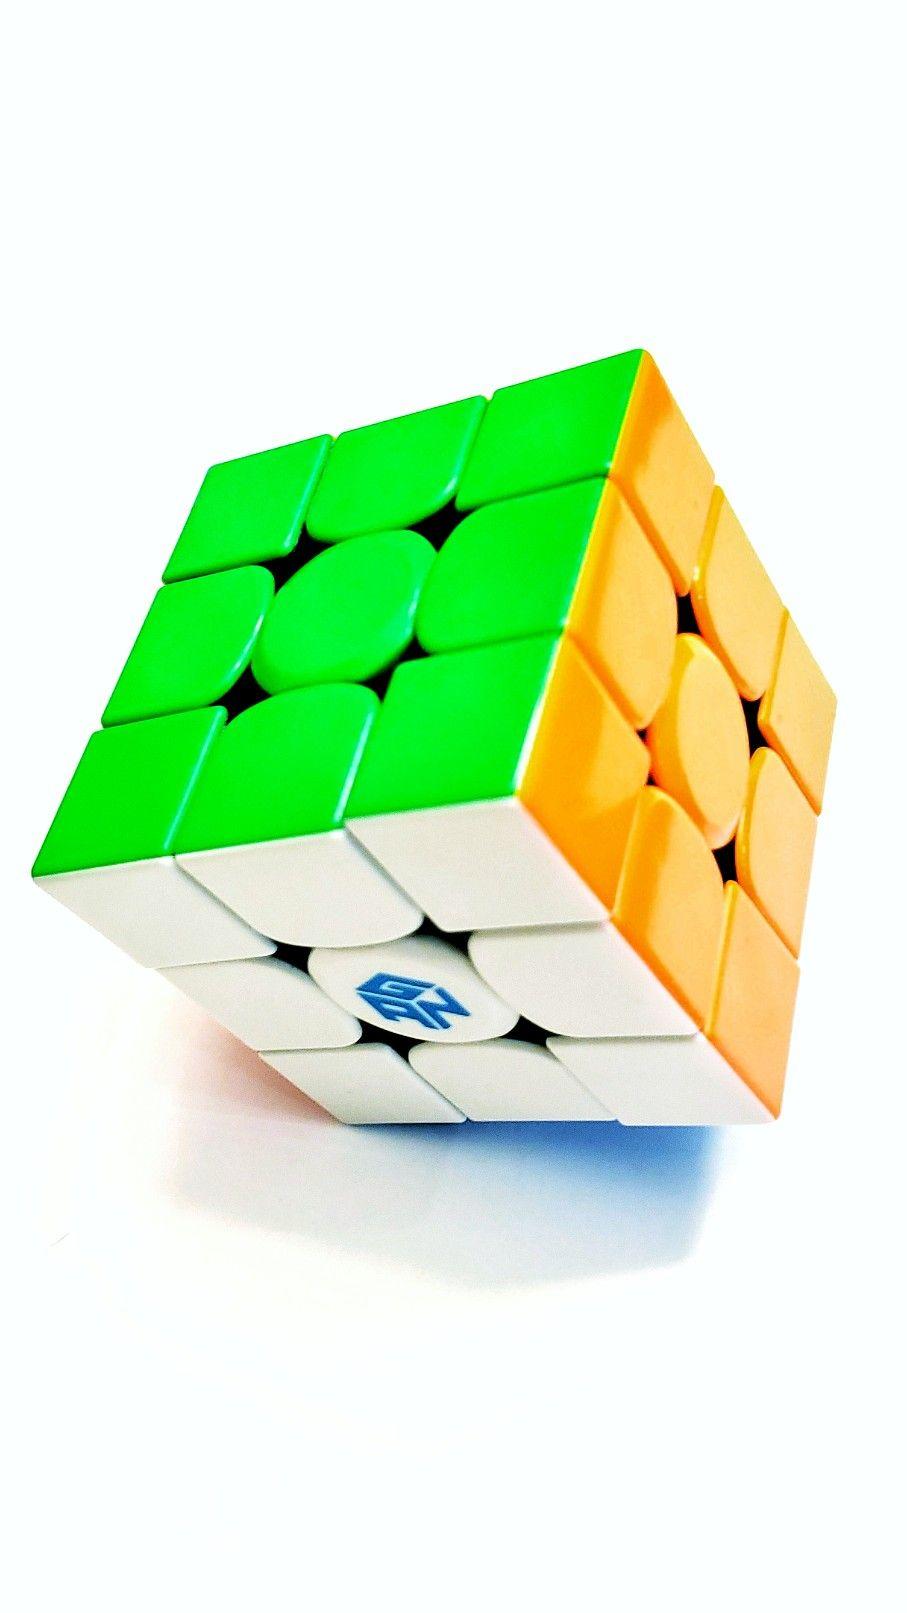 Rubiks Cube Wallpaper Rubiks Cube Cube Wallpaper